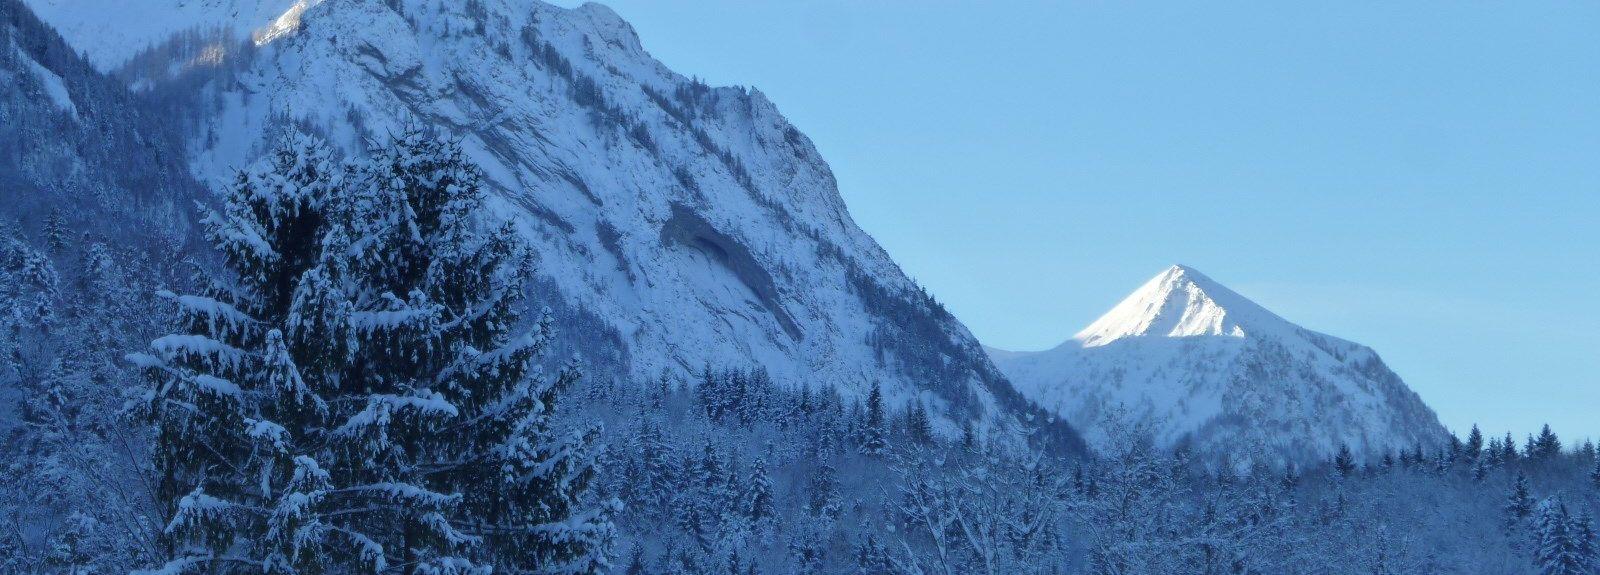 Gosau, Upper Austria, Austria